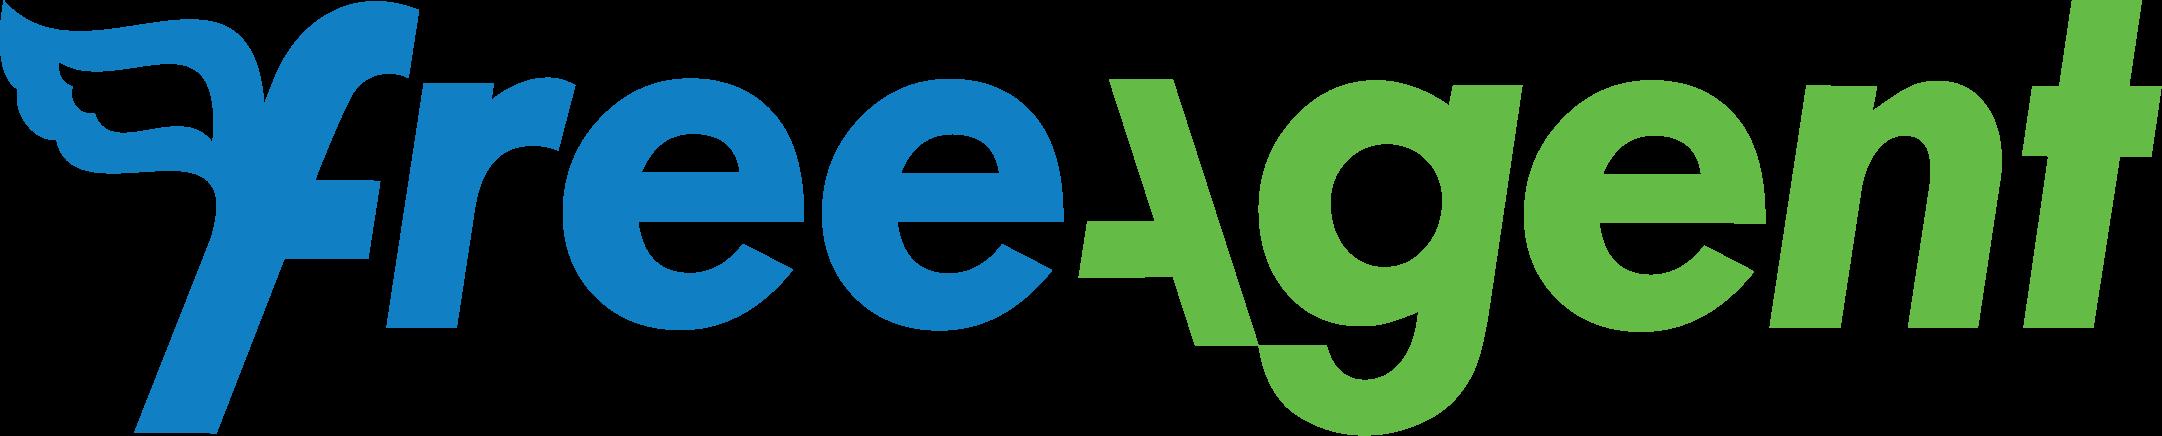 Freeagent logo wordmark bluegreen CMYK